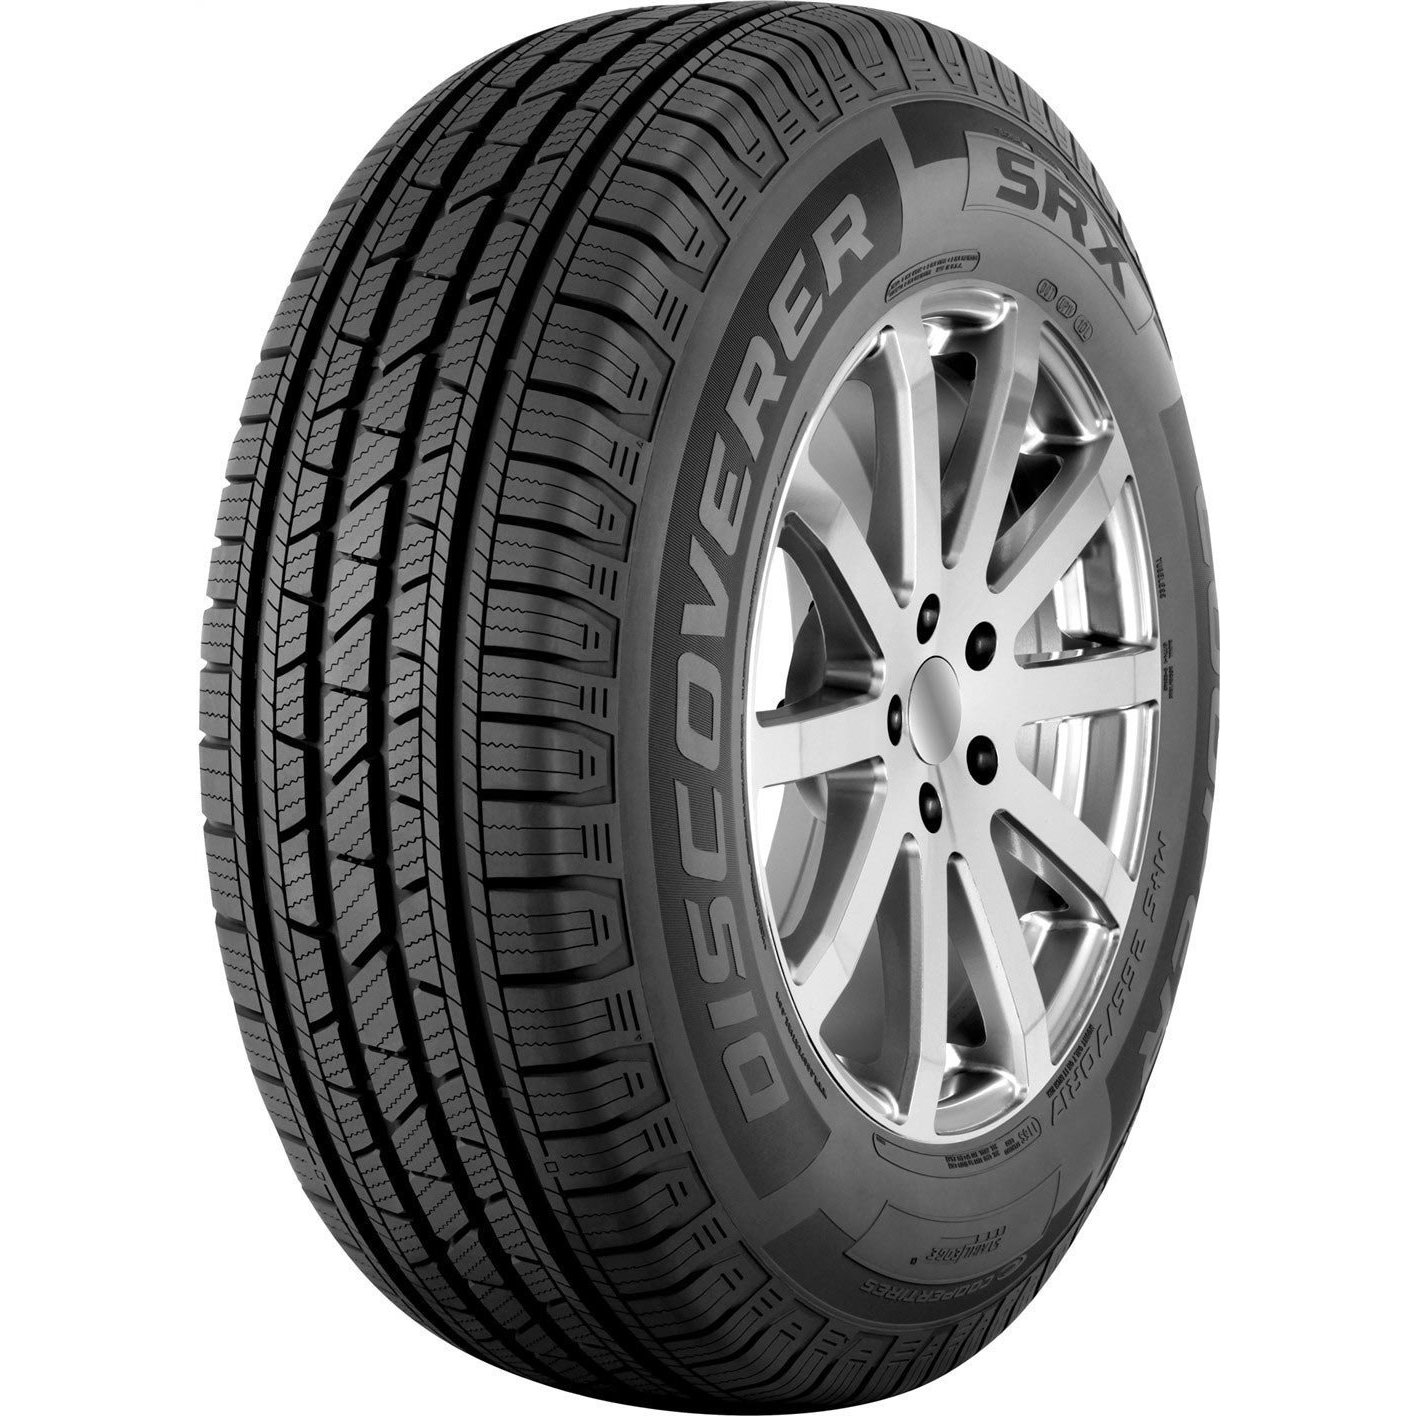 COOPER Discoverer SRX All Season Tire - 225/75R16 104T (B...